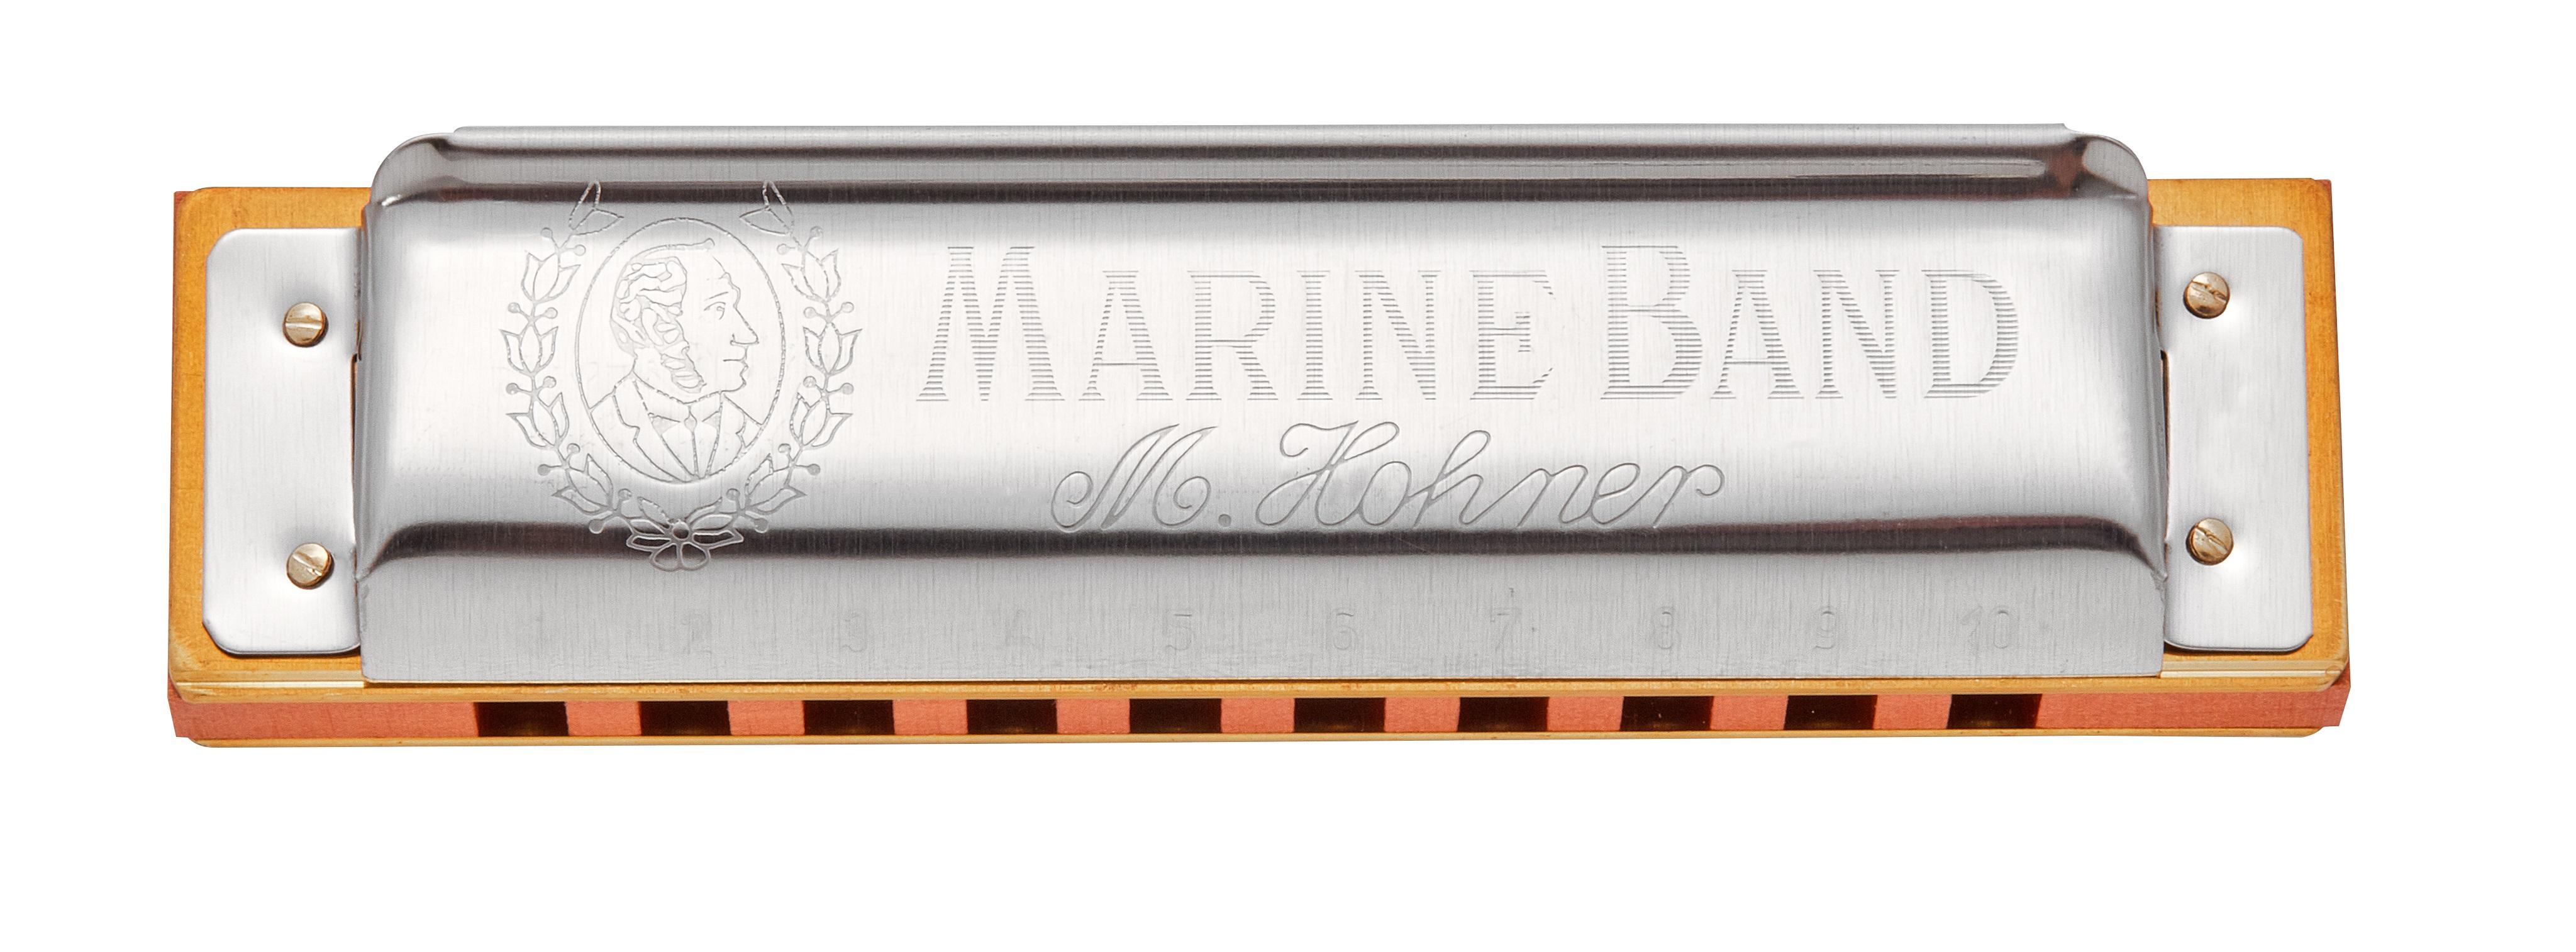 Hohner Marine Band 1896 G-natural minor